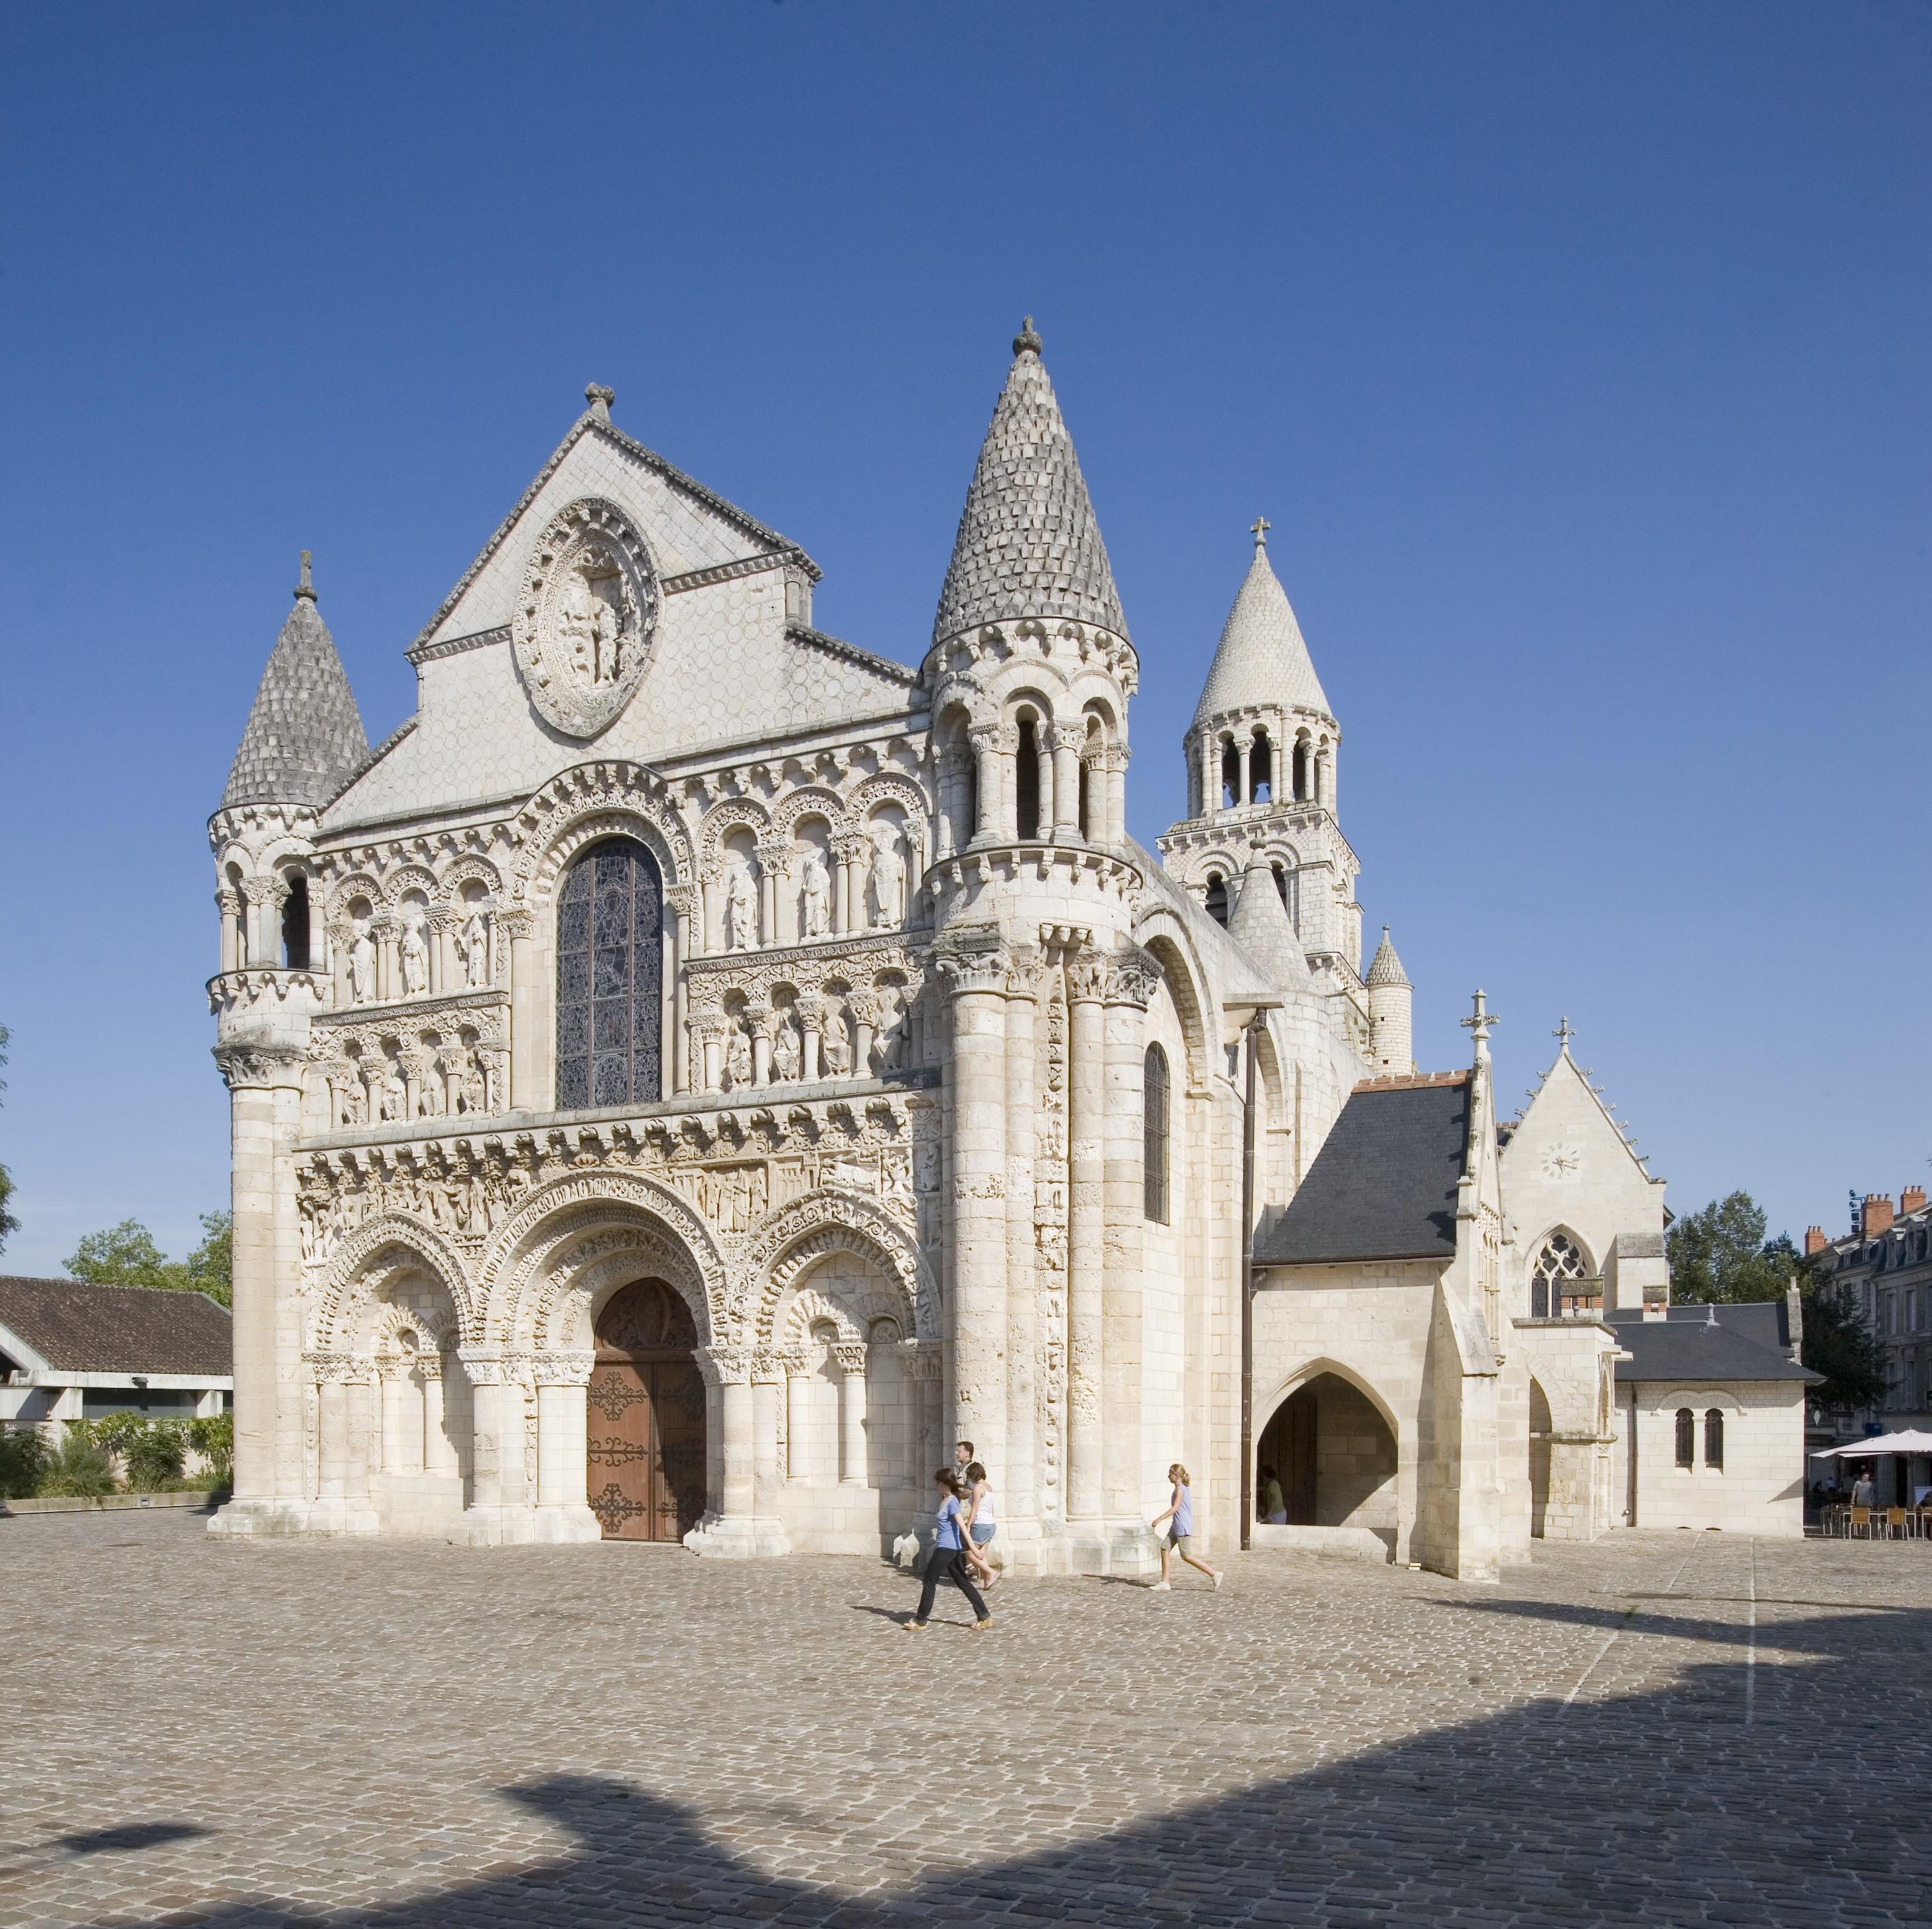 Eglise-Notre-Dame-Poitiers